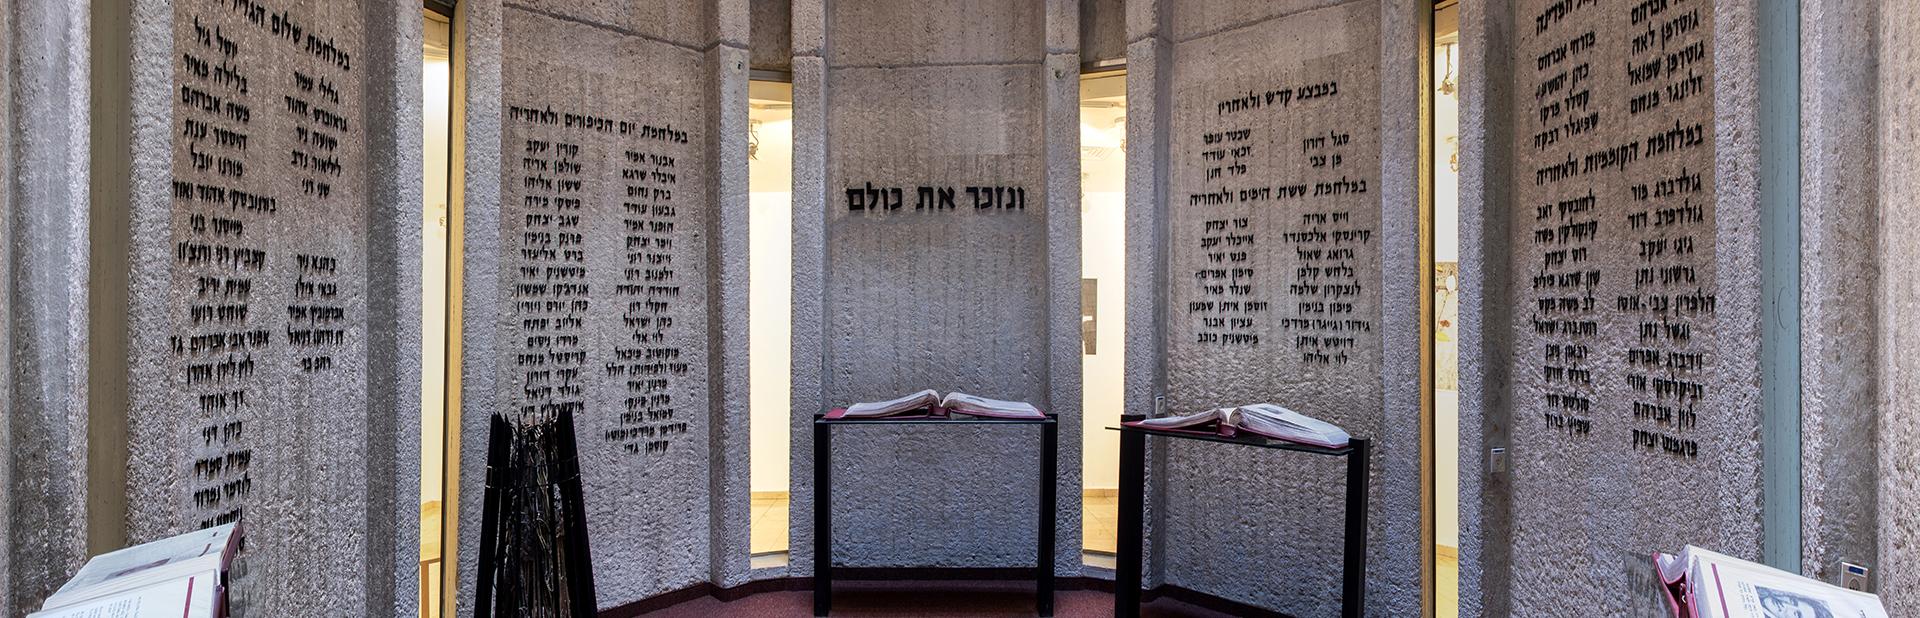 memorial center